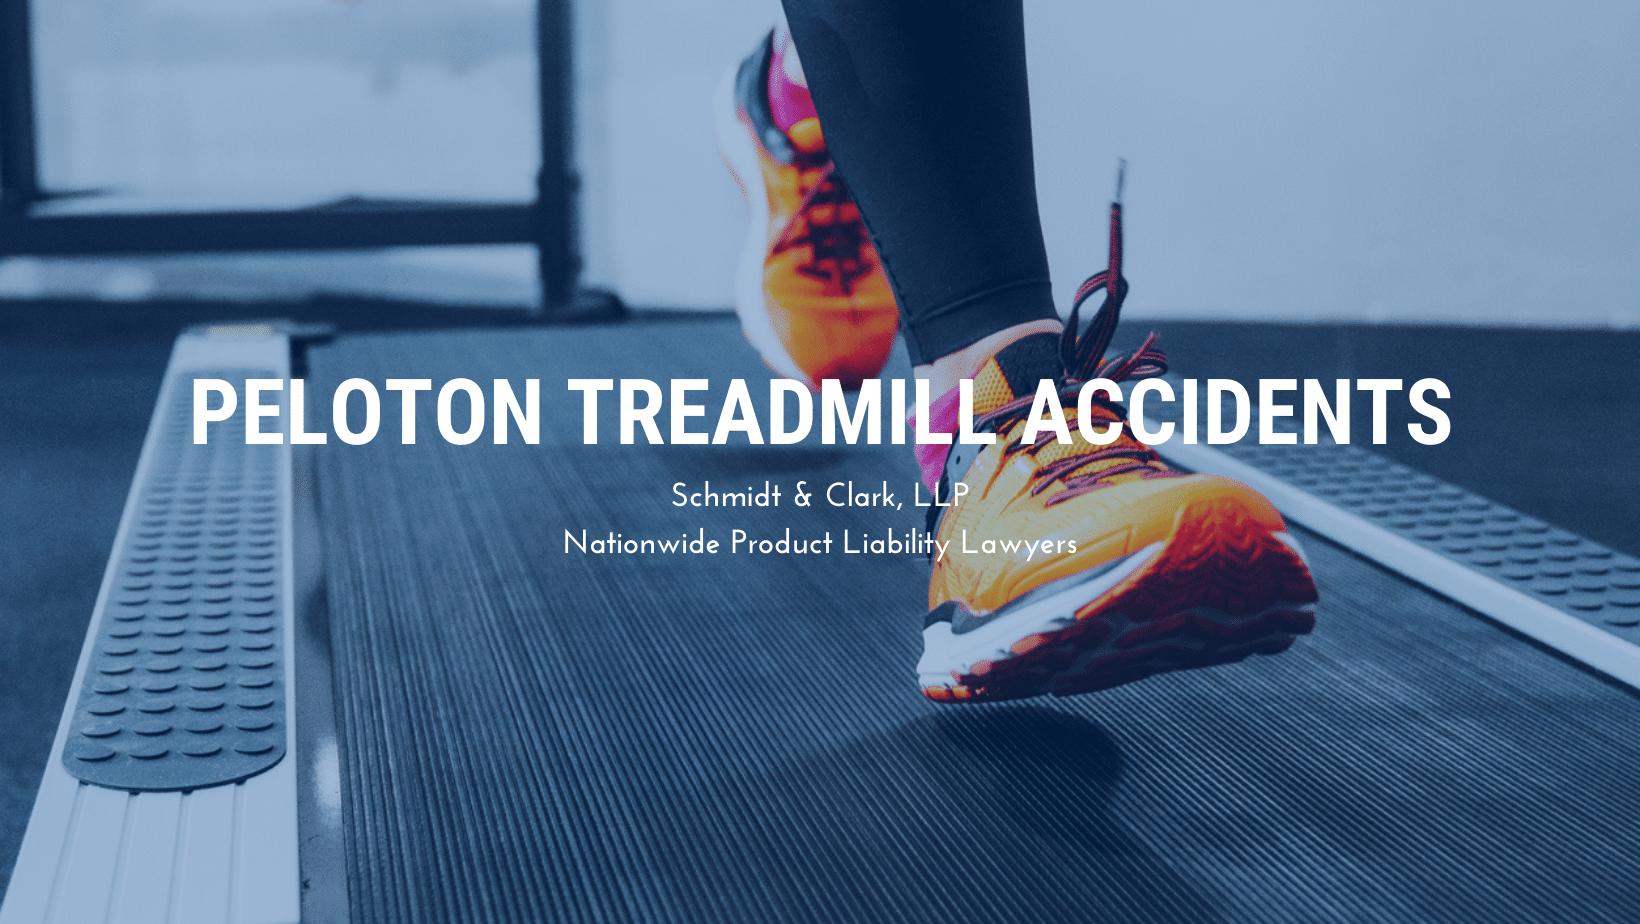 Peloton treadmill accidents lawsuit lawyer